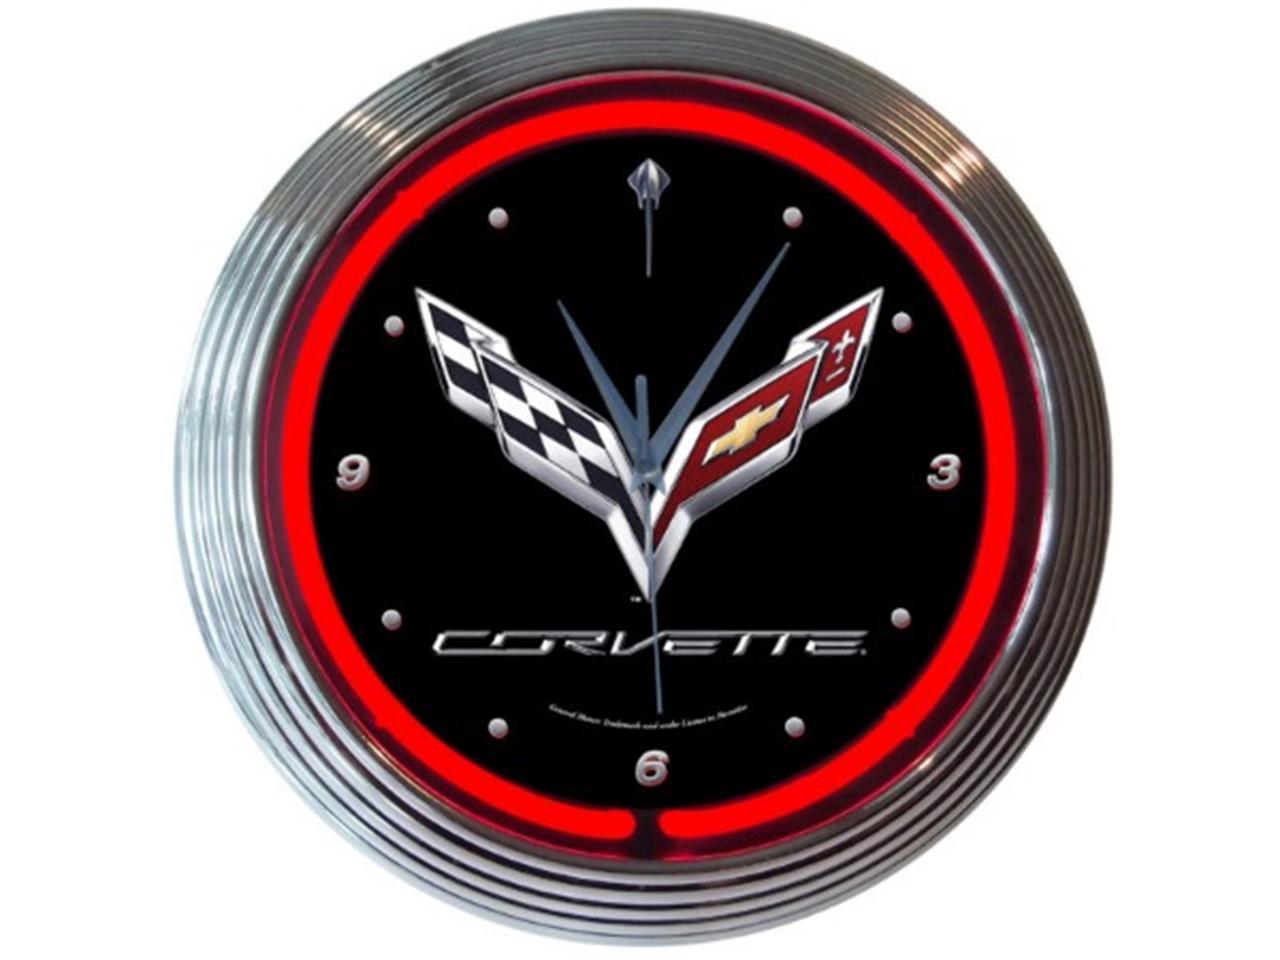 2018 Chevrolet Corvette (CC-1176546) for sale in San Ramon, California